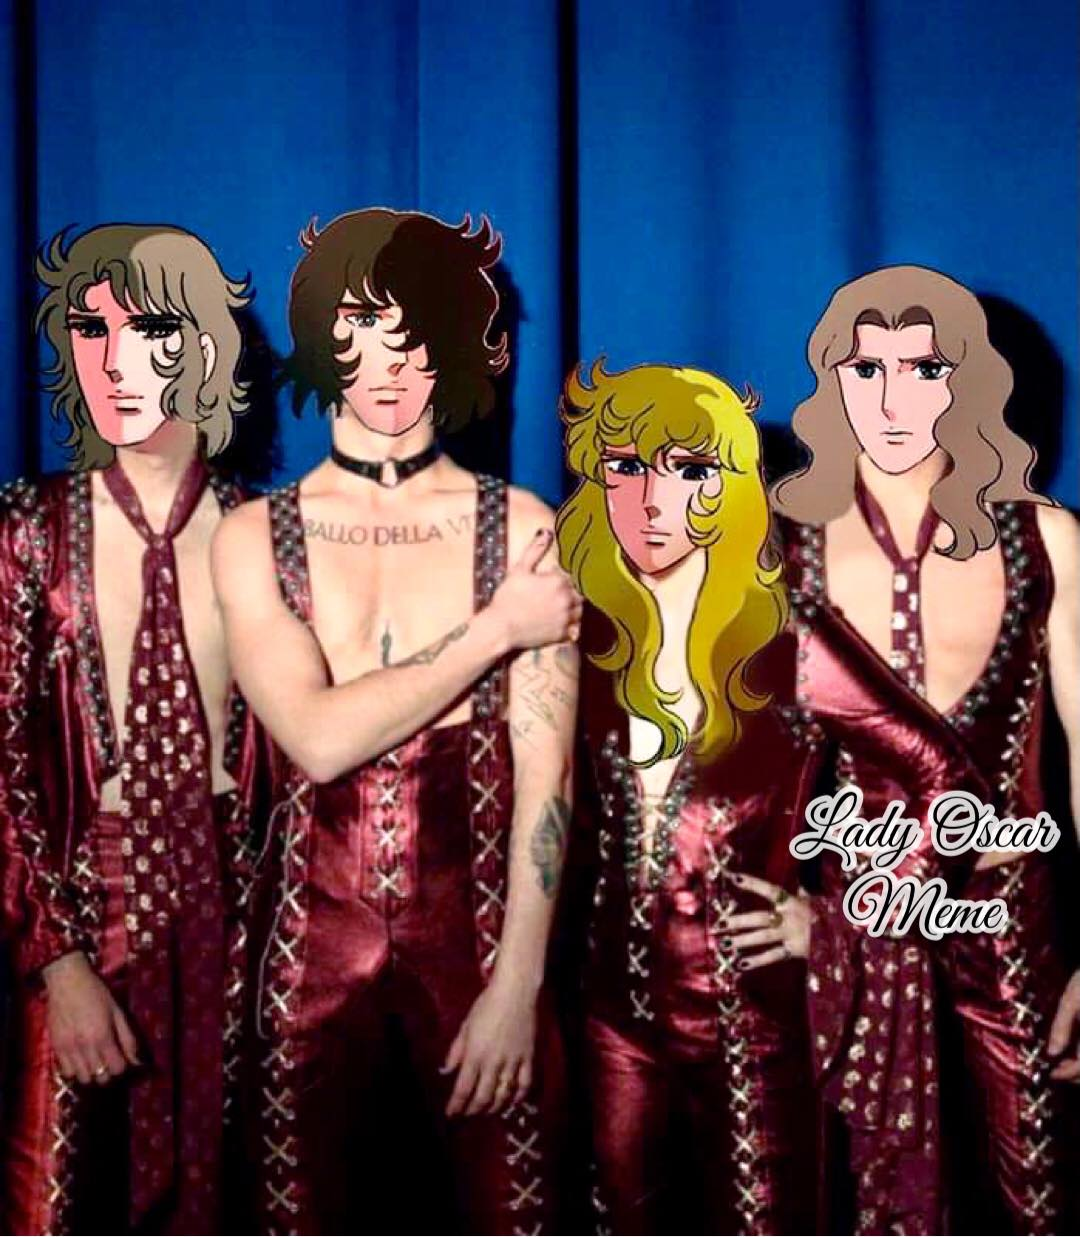 maneskin eurovision lady oscar